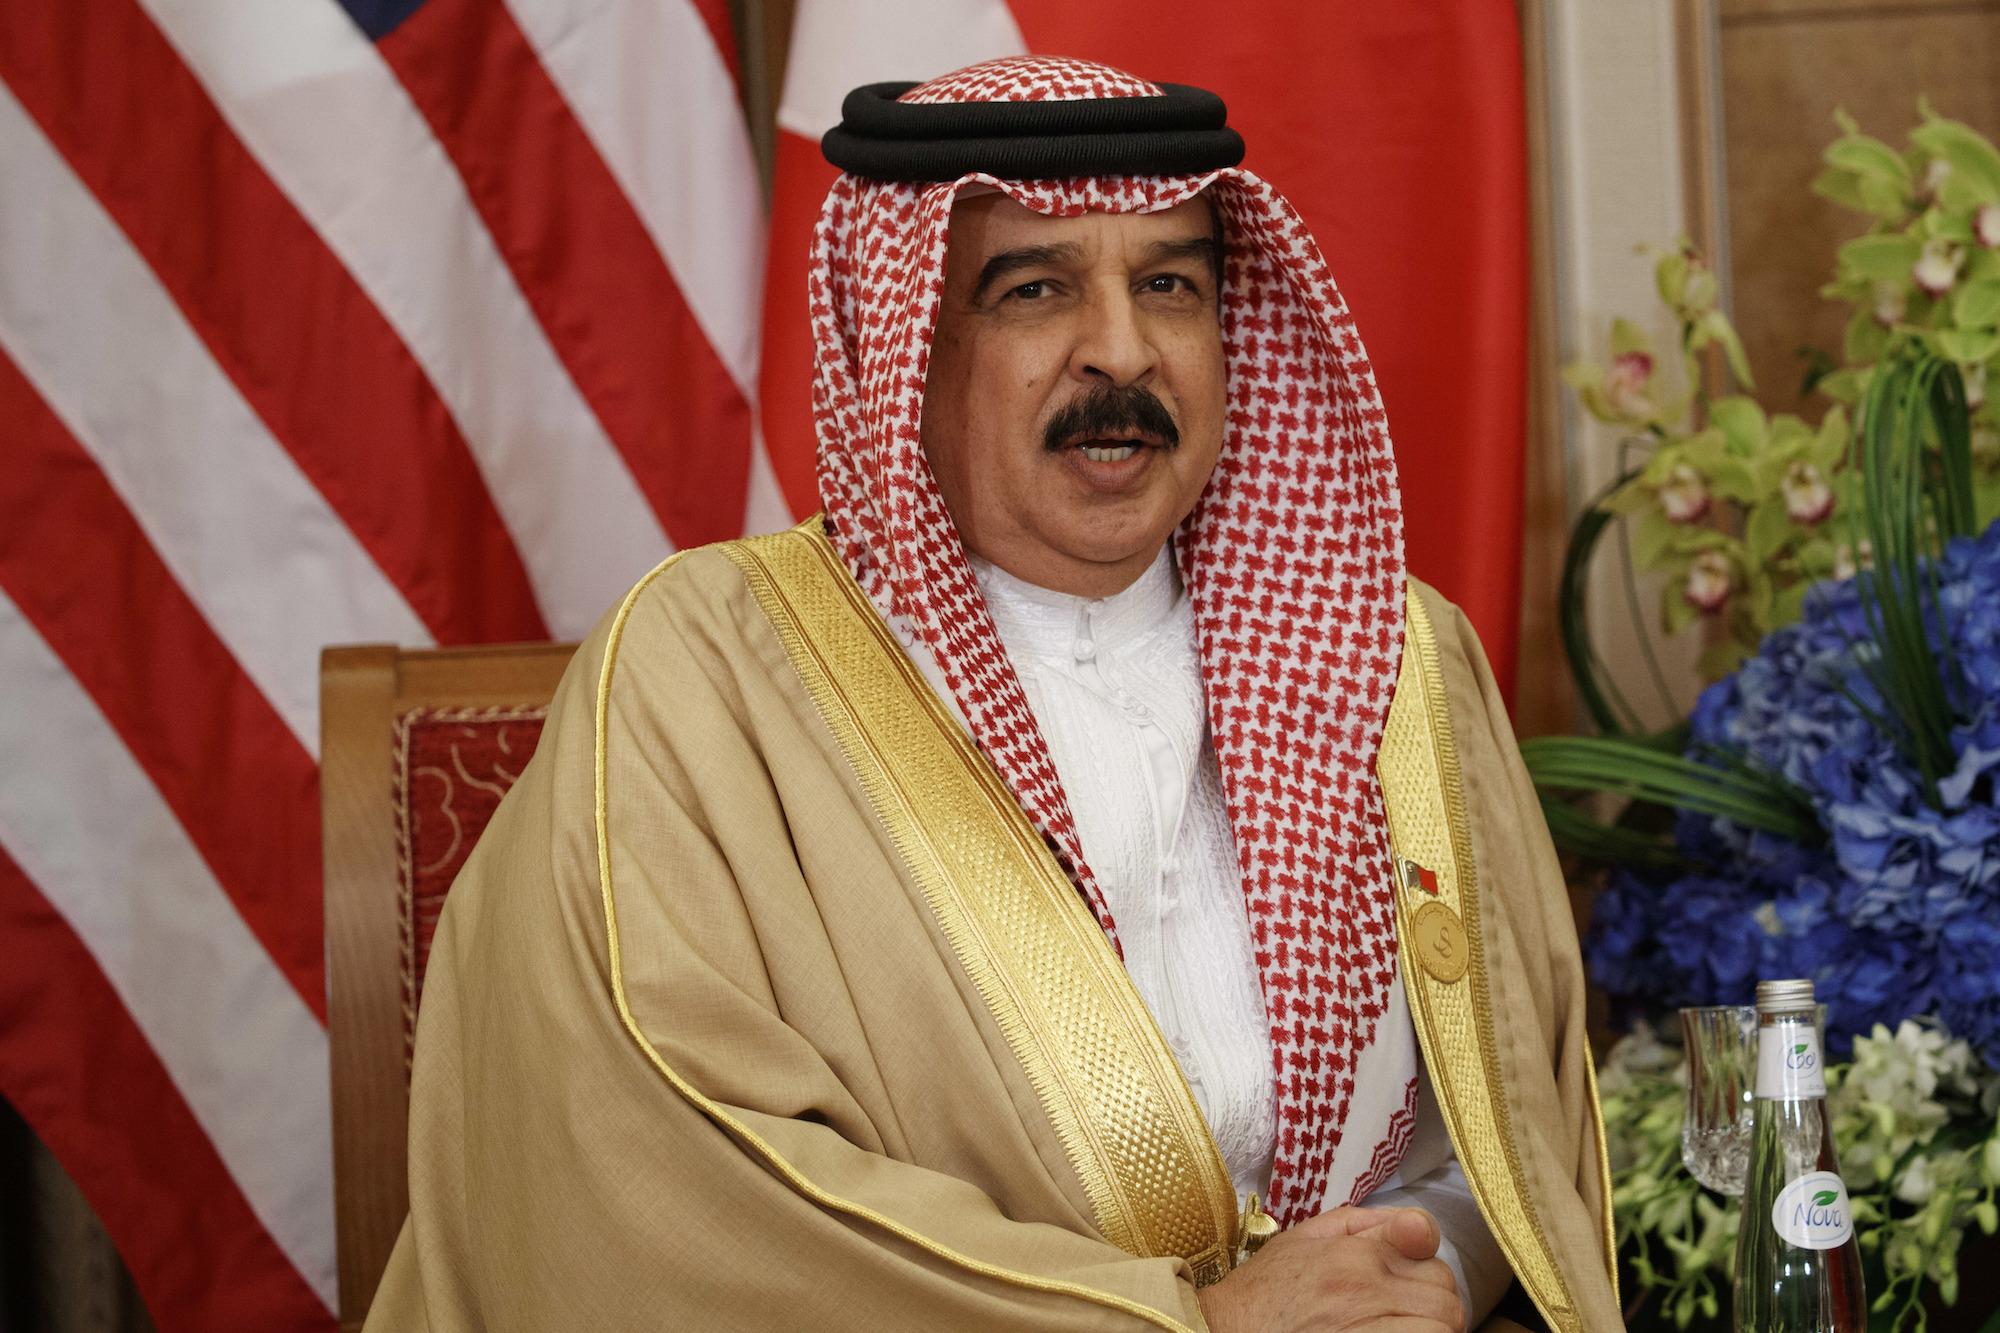 Bahraini King Hamad al-Khalifa